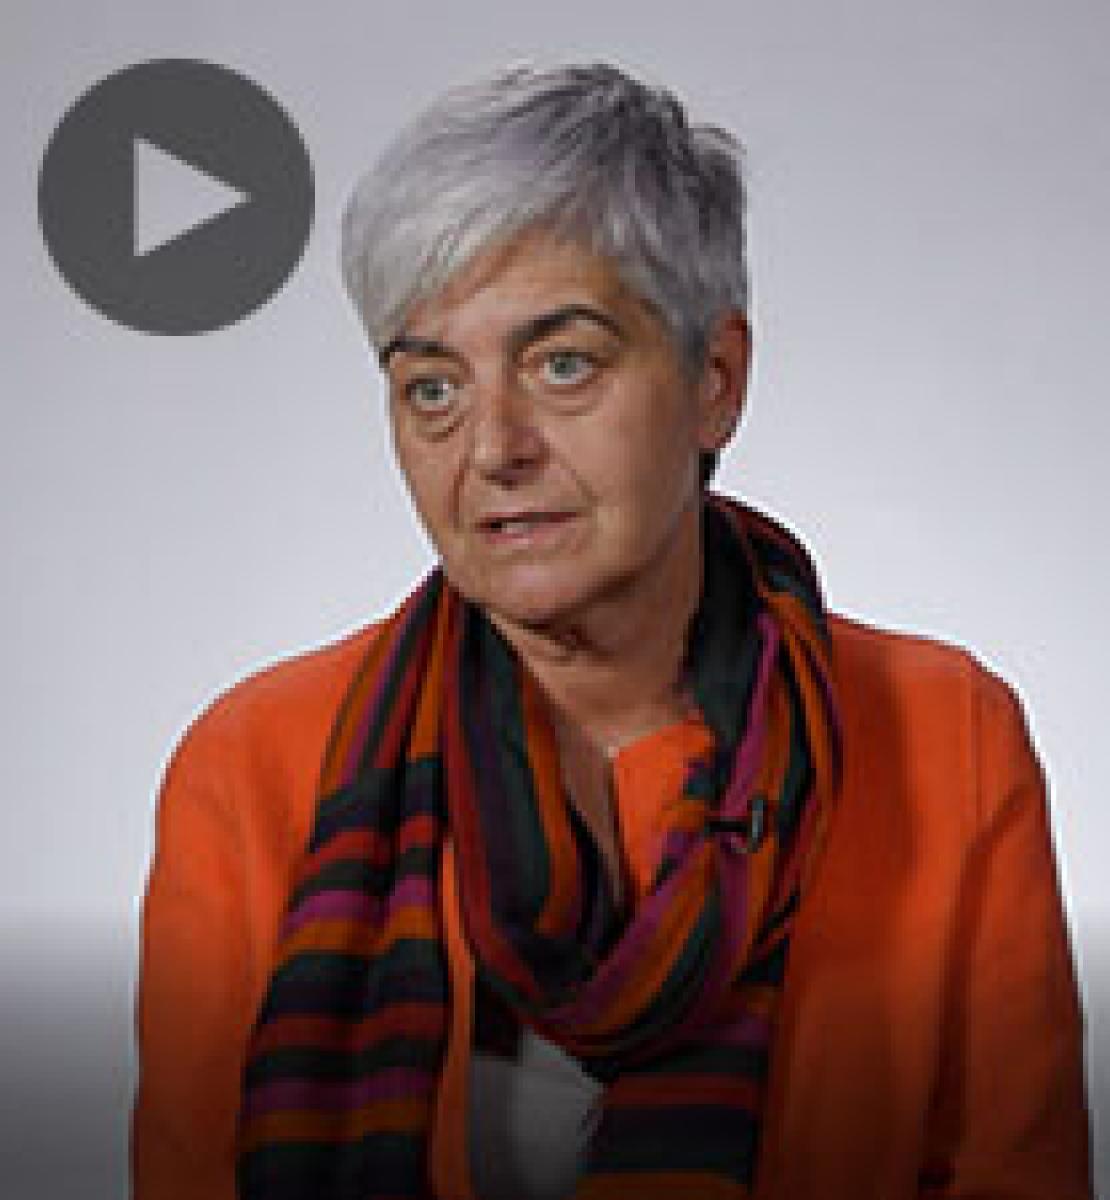 Screenshot from video message shows Resident Coordinator, Barbara Manzi